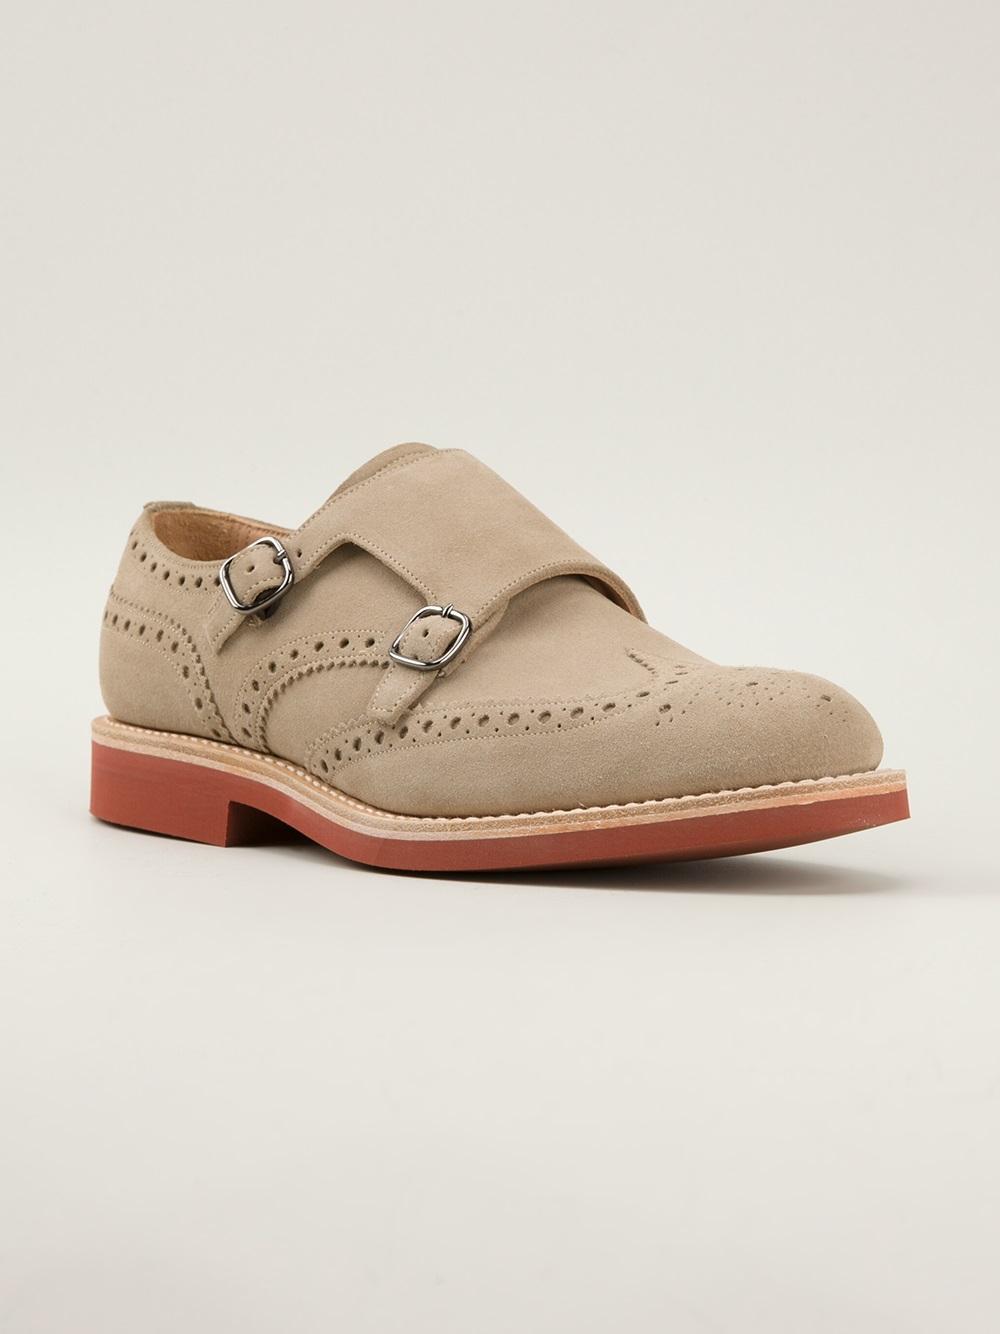 Church S Shoes Rubber Sole